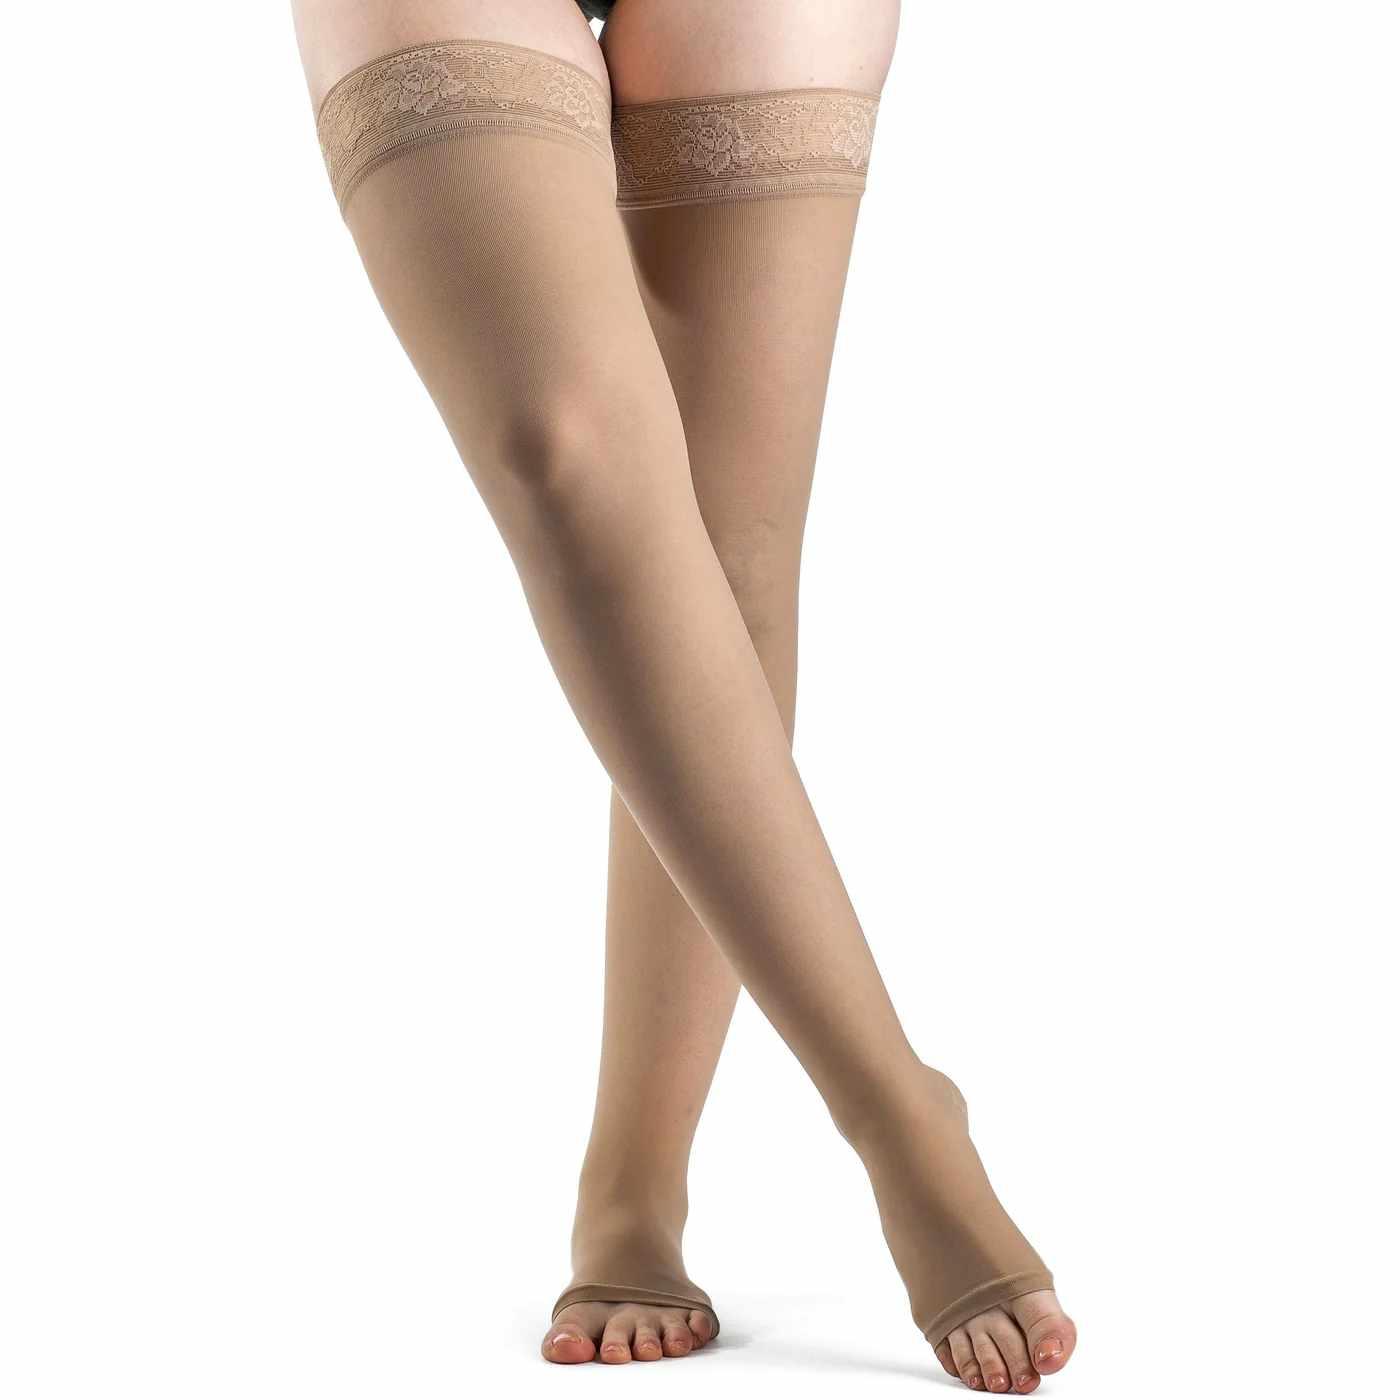 Sigvaris EverSheer Women's Thigh-High Compression Stocking w/Grip-top, Large Long, 20-30 mmHg- Pair